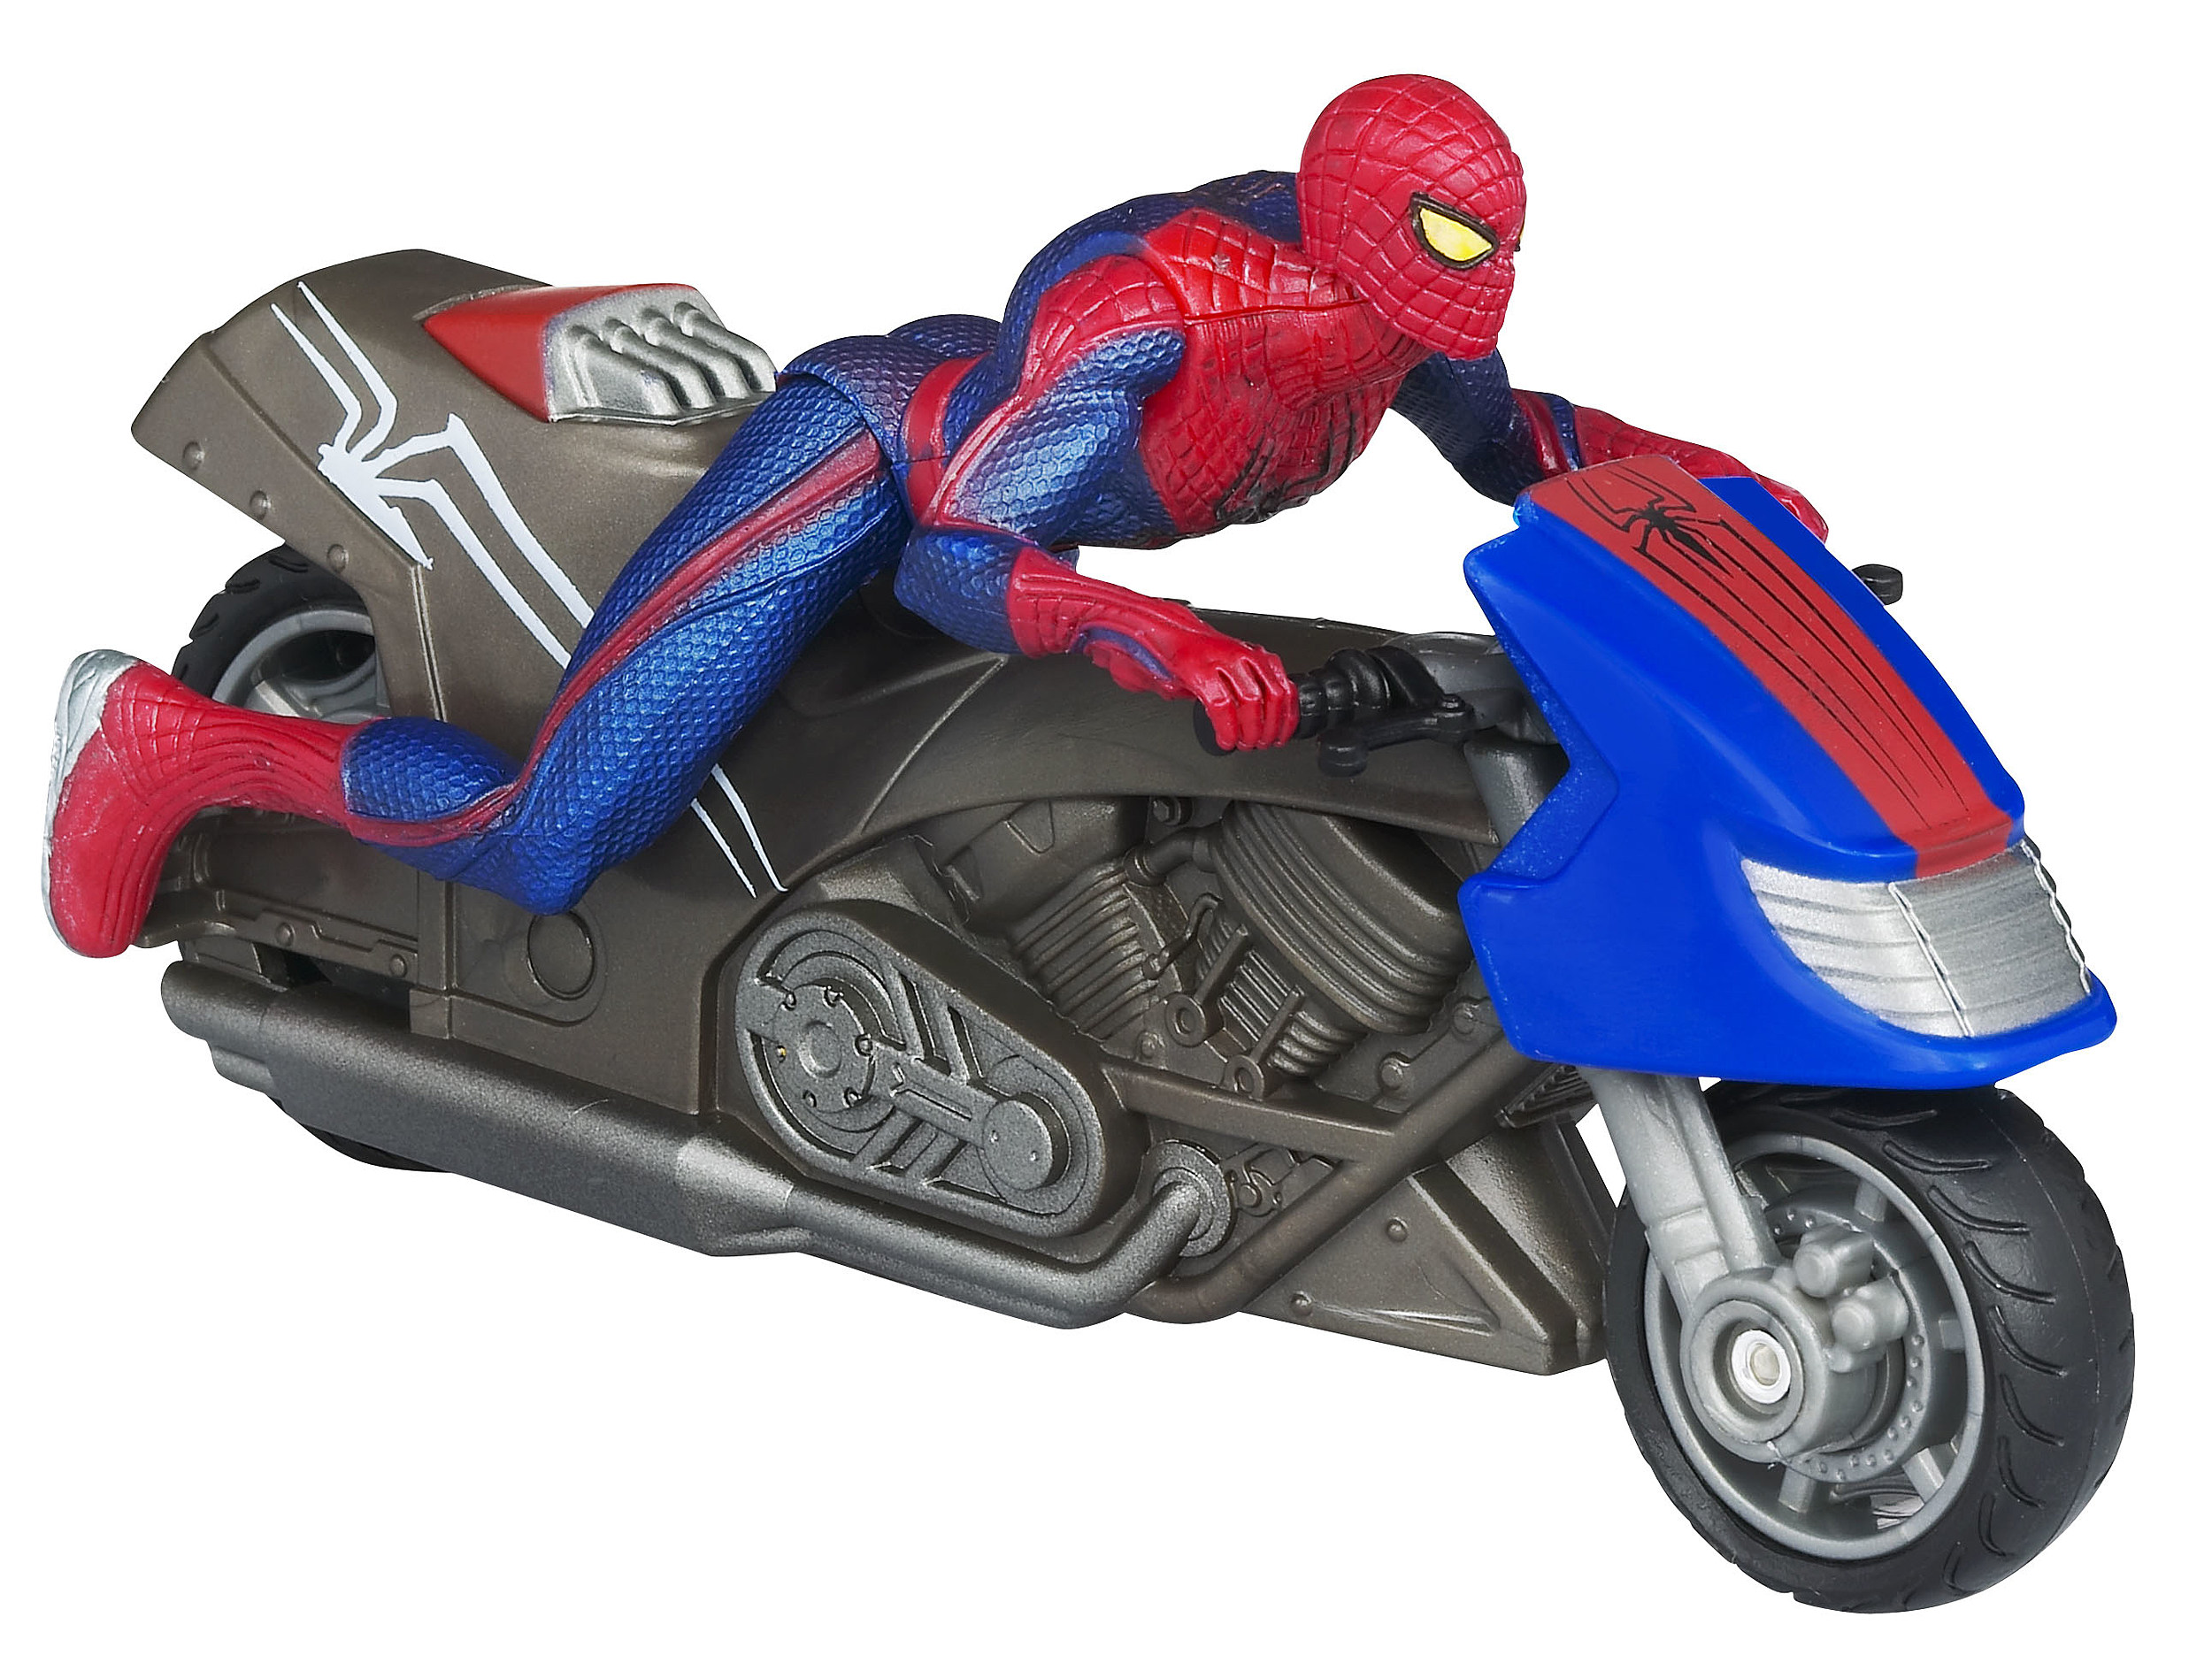 Incredible acrobatic motorbike accident dash cam videos know your meme - Spider man moto ...